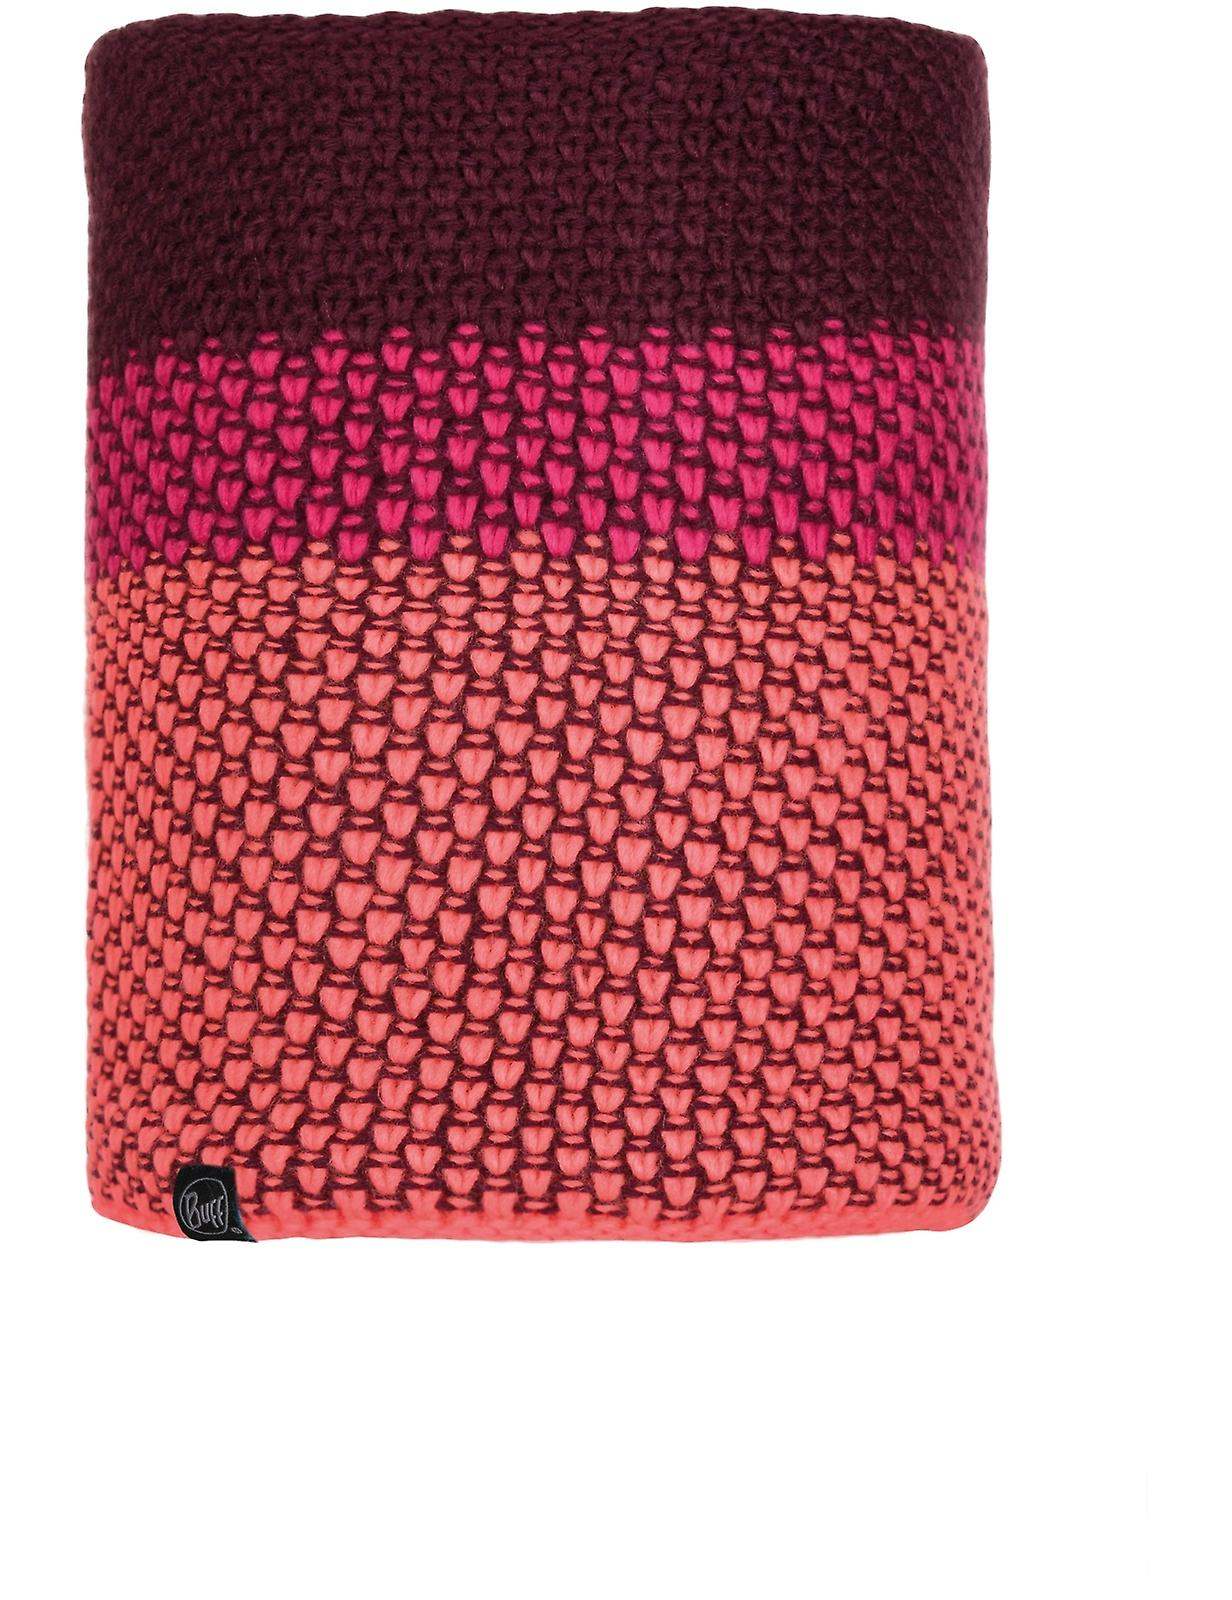 Buff Tilda Knitted Neck Warmer